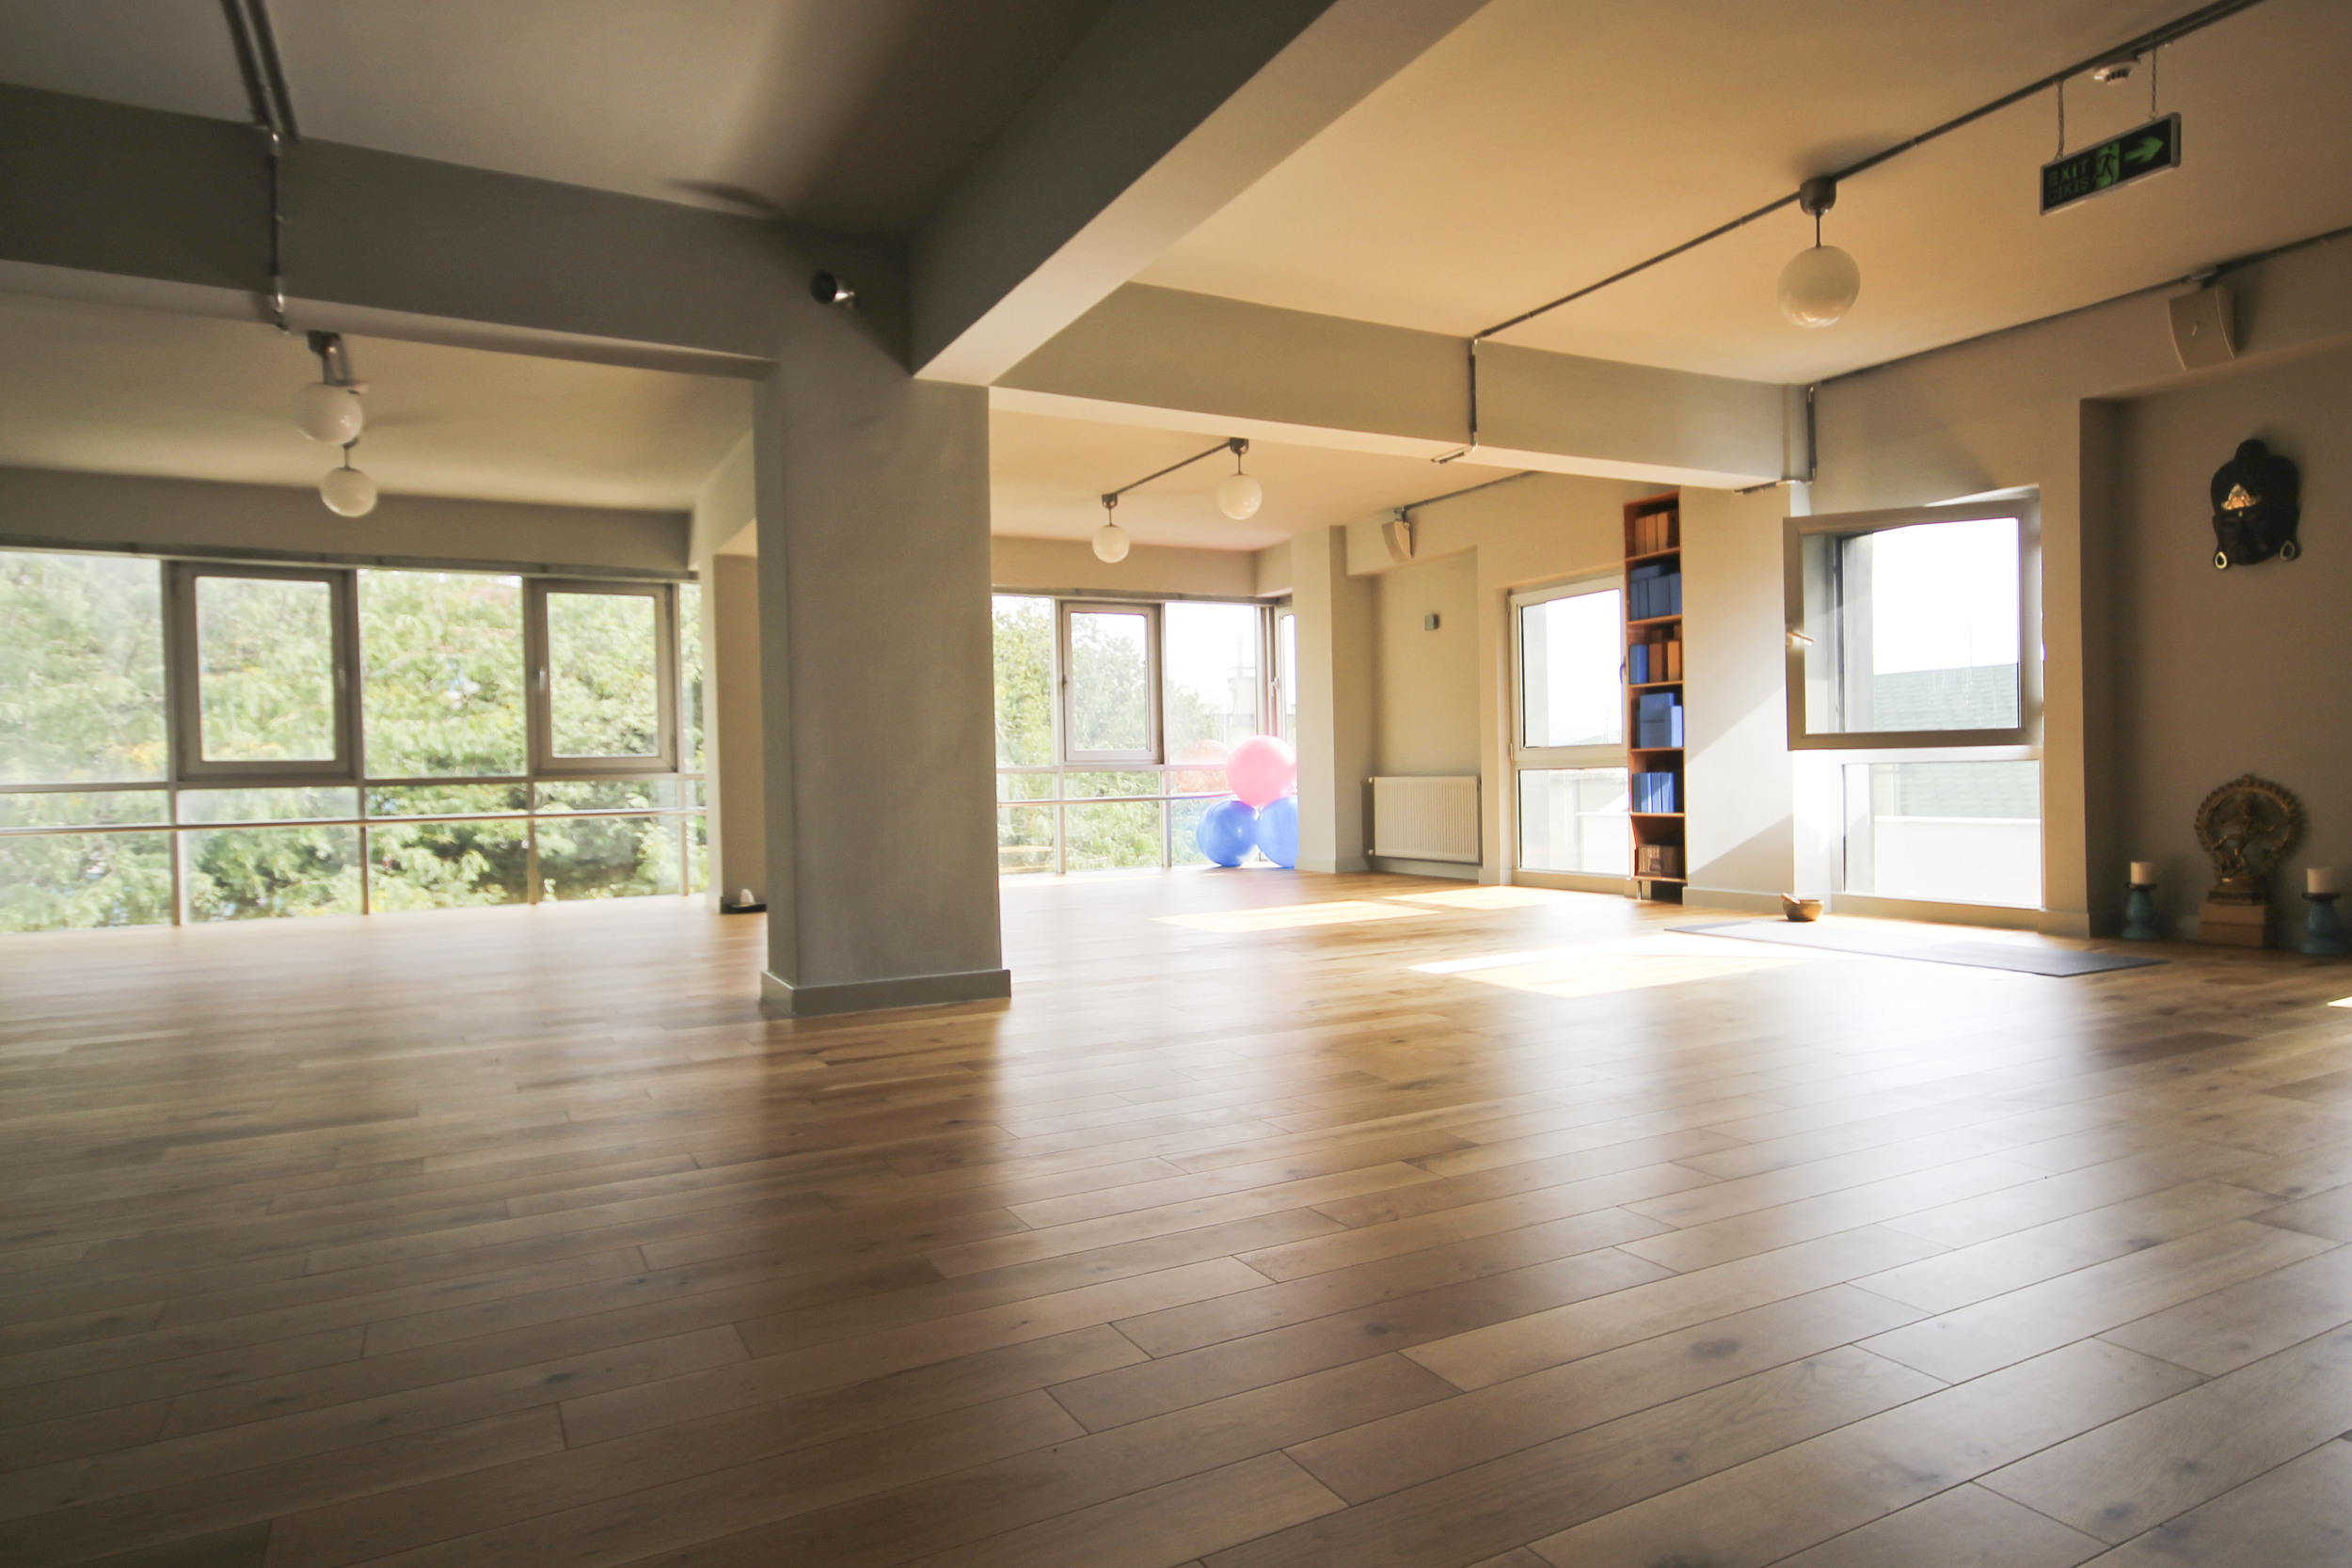 cihangir yoga studio istanbul cihangir2961.jpg